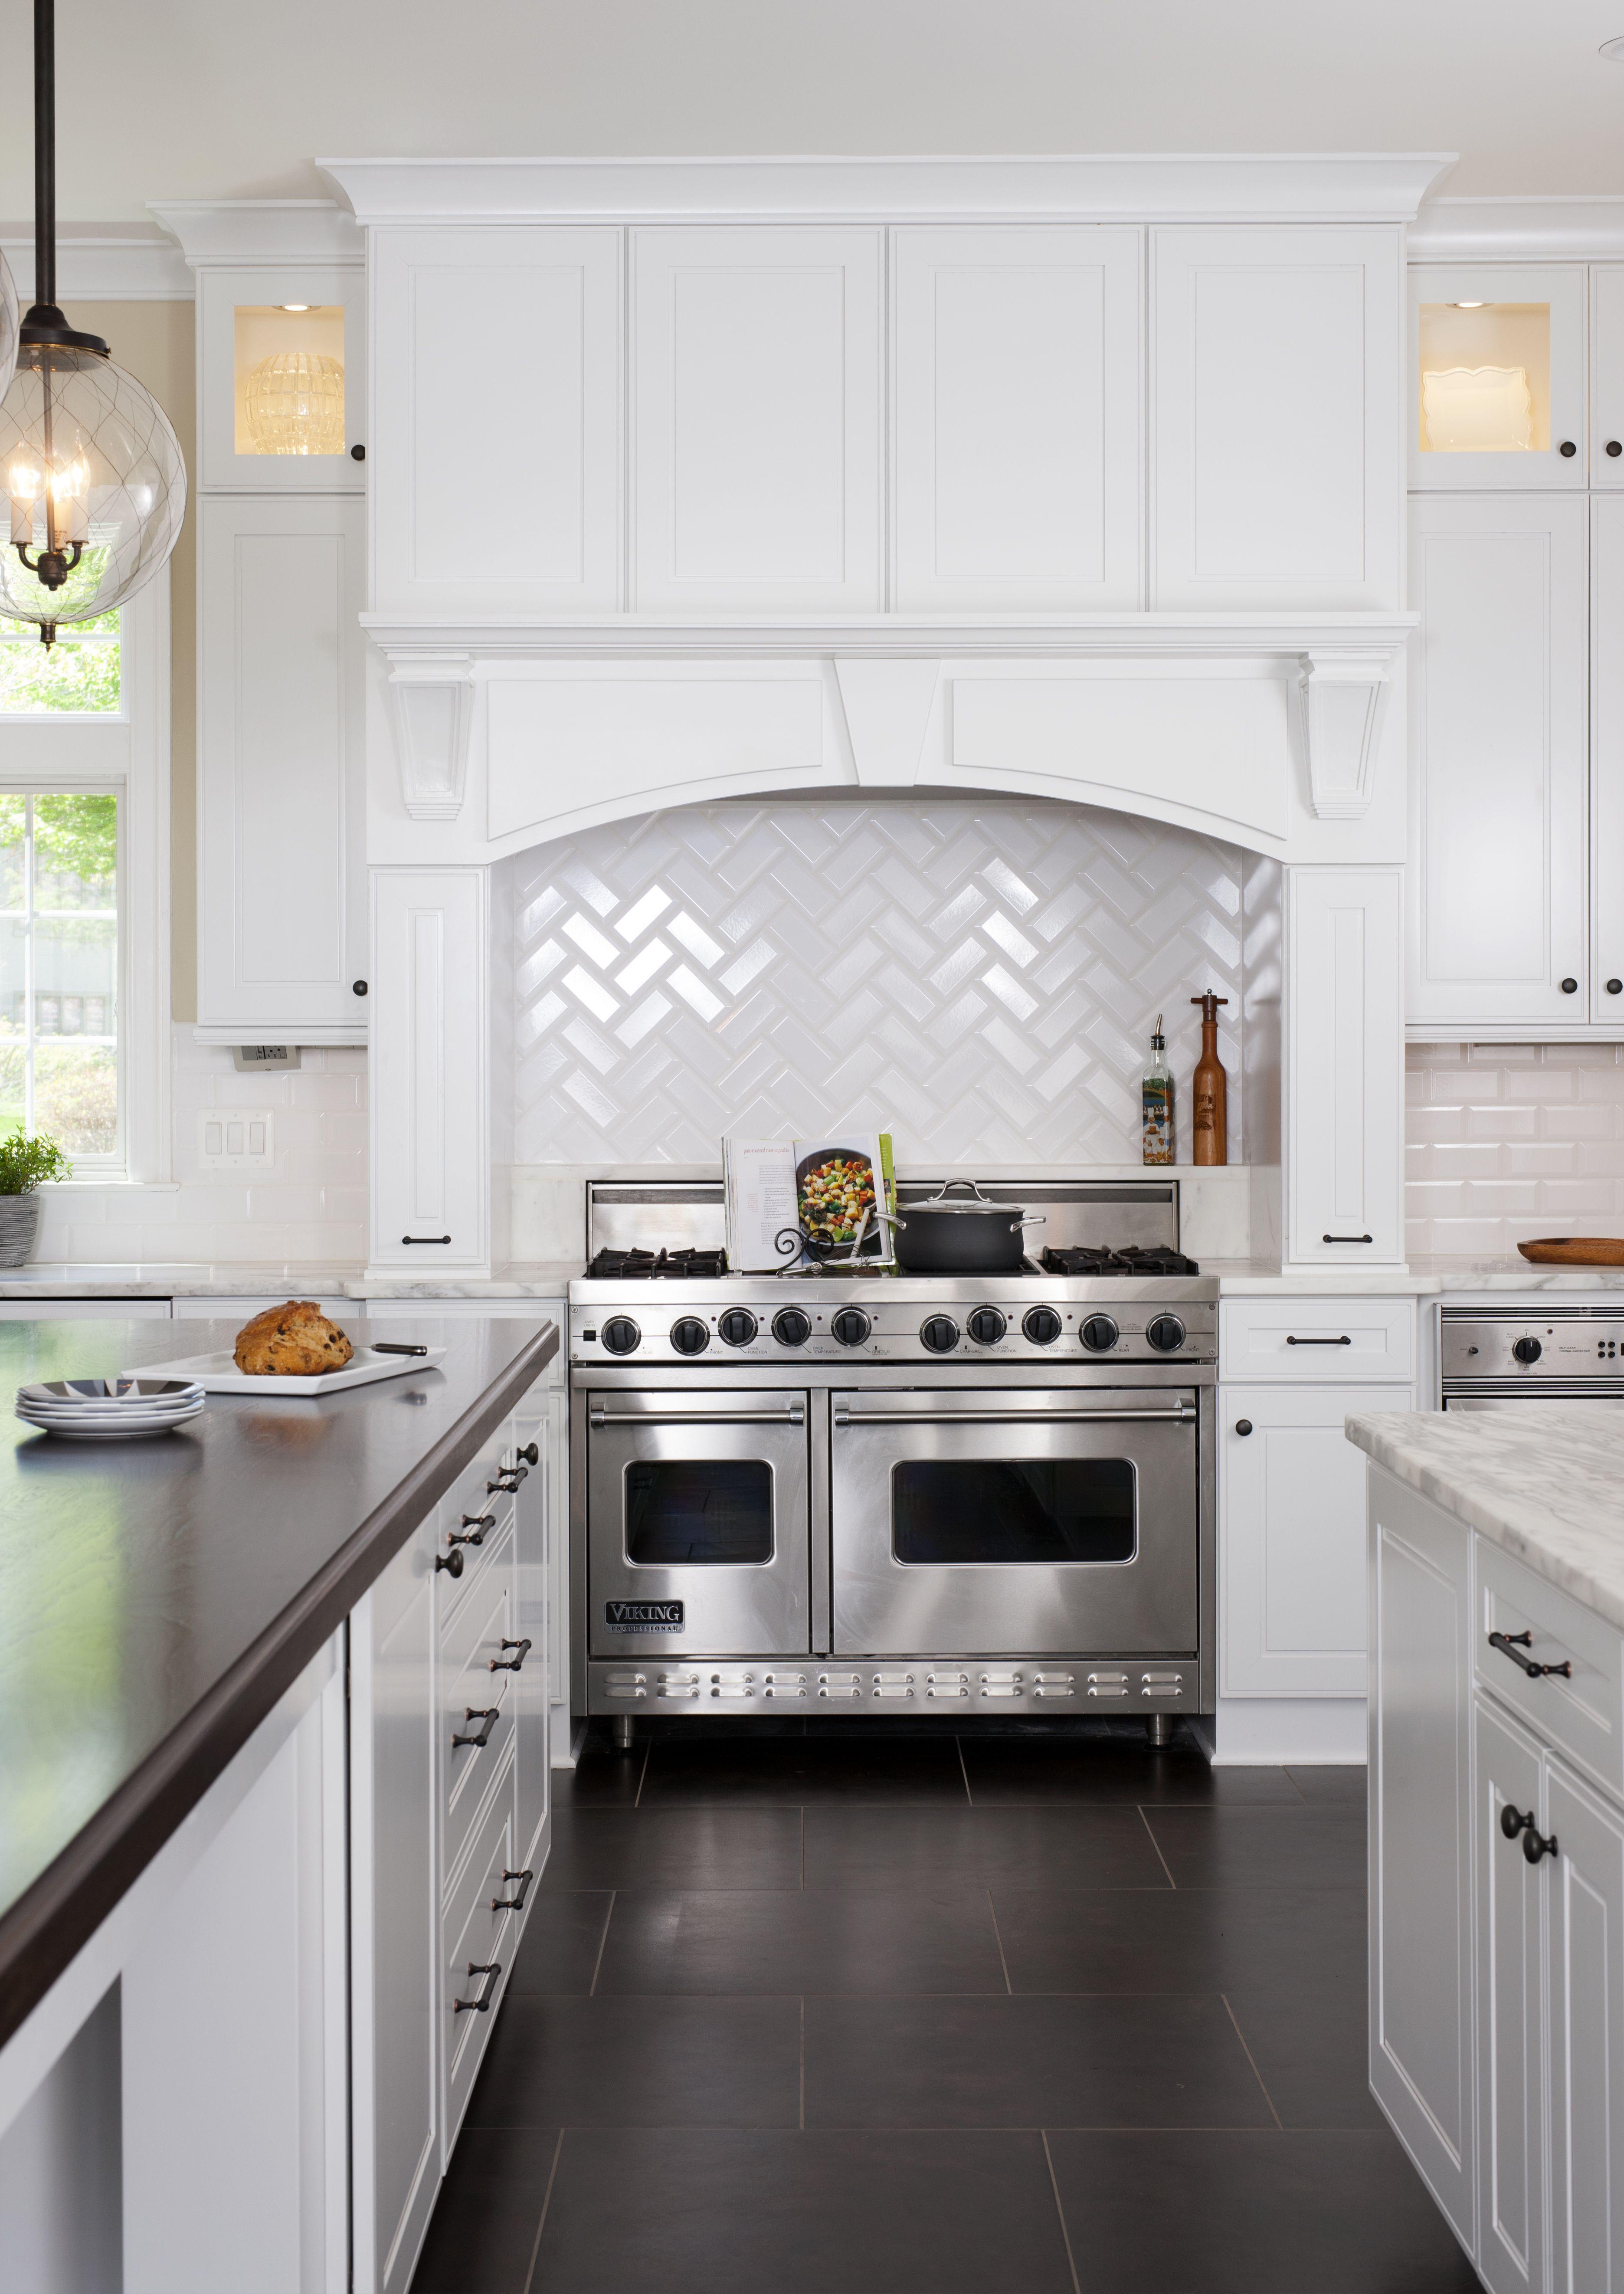 Classic white kitchen - A Classic White Kitchen Featuring Calacatta Marble Countertops And Custom Walnut Island